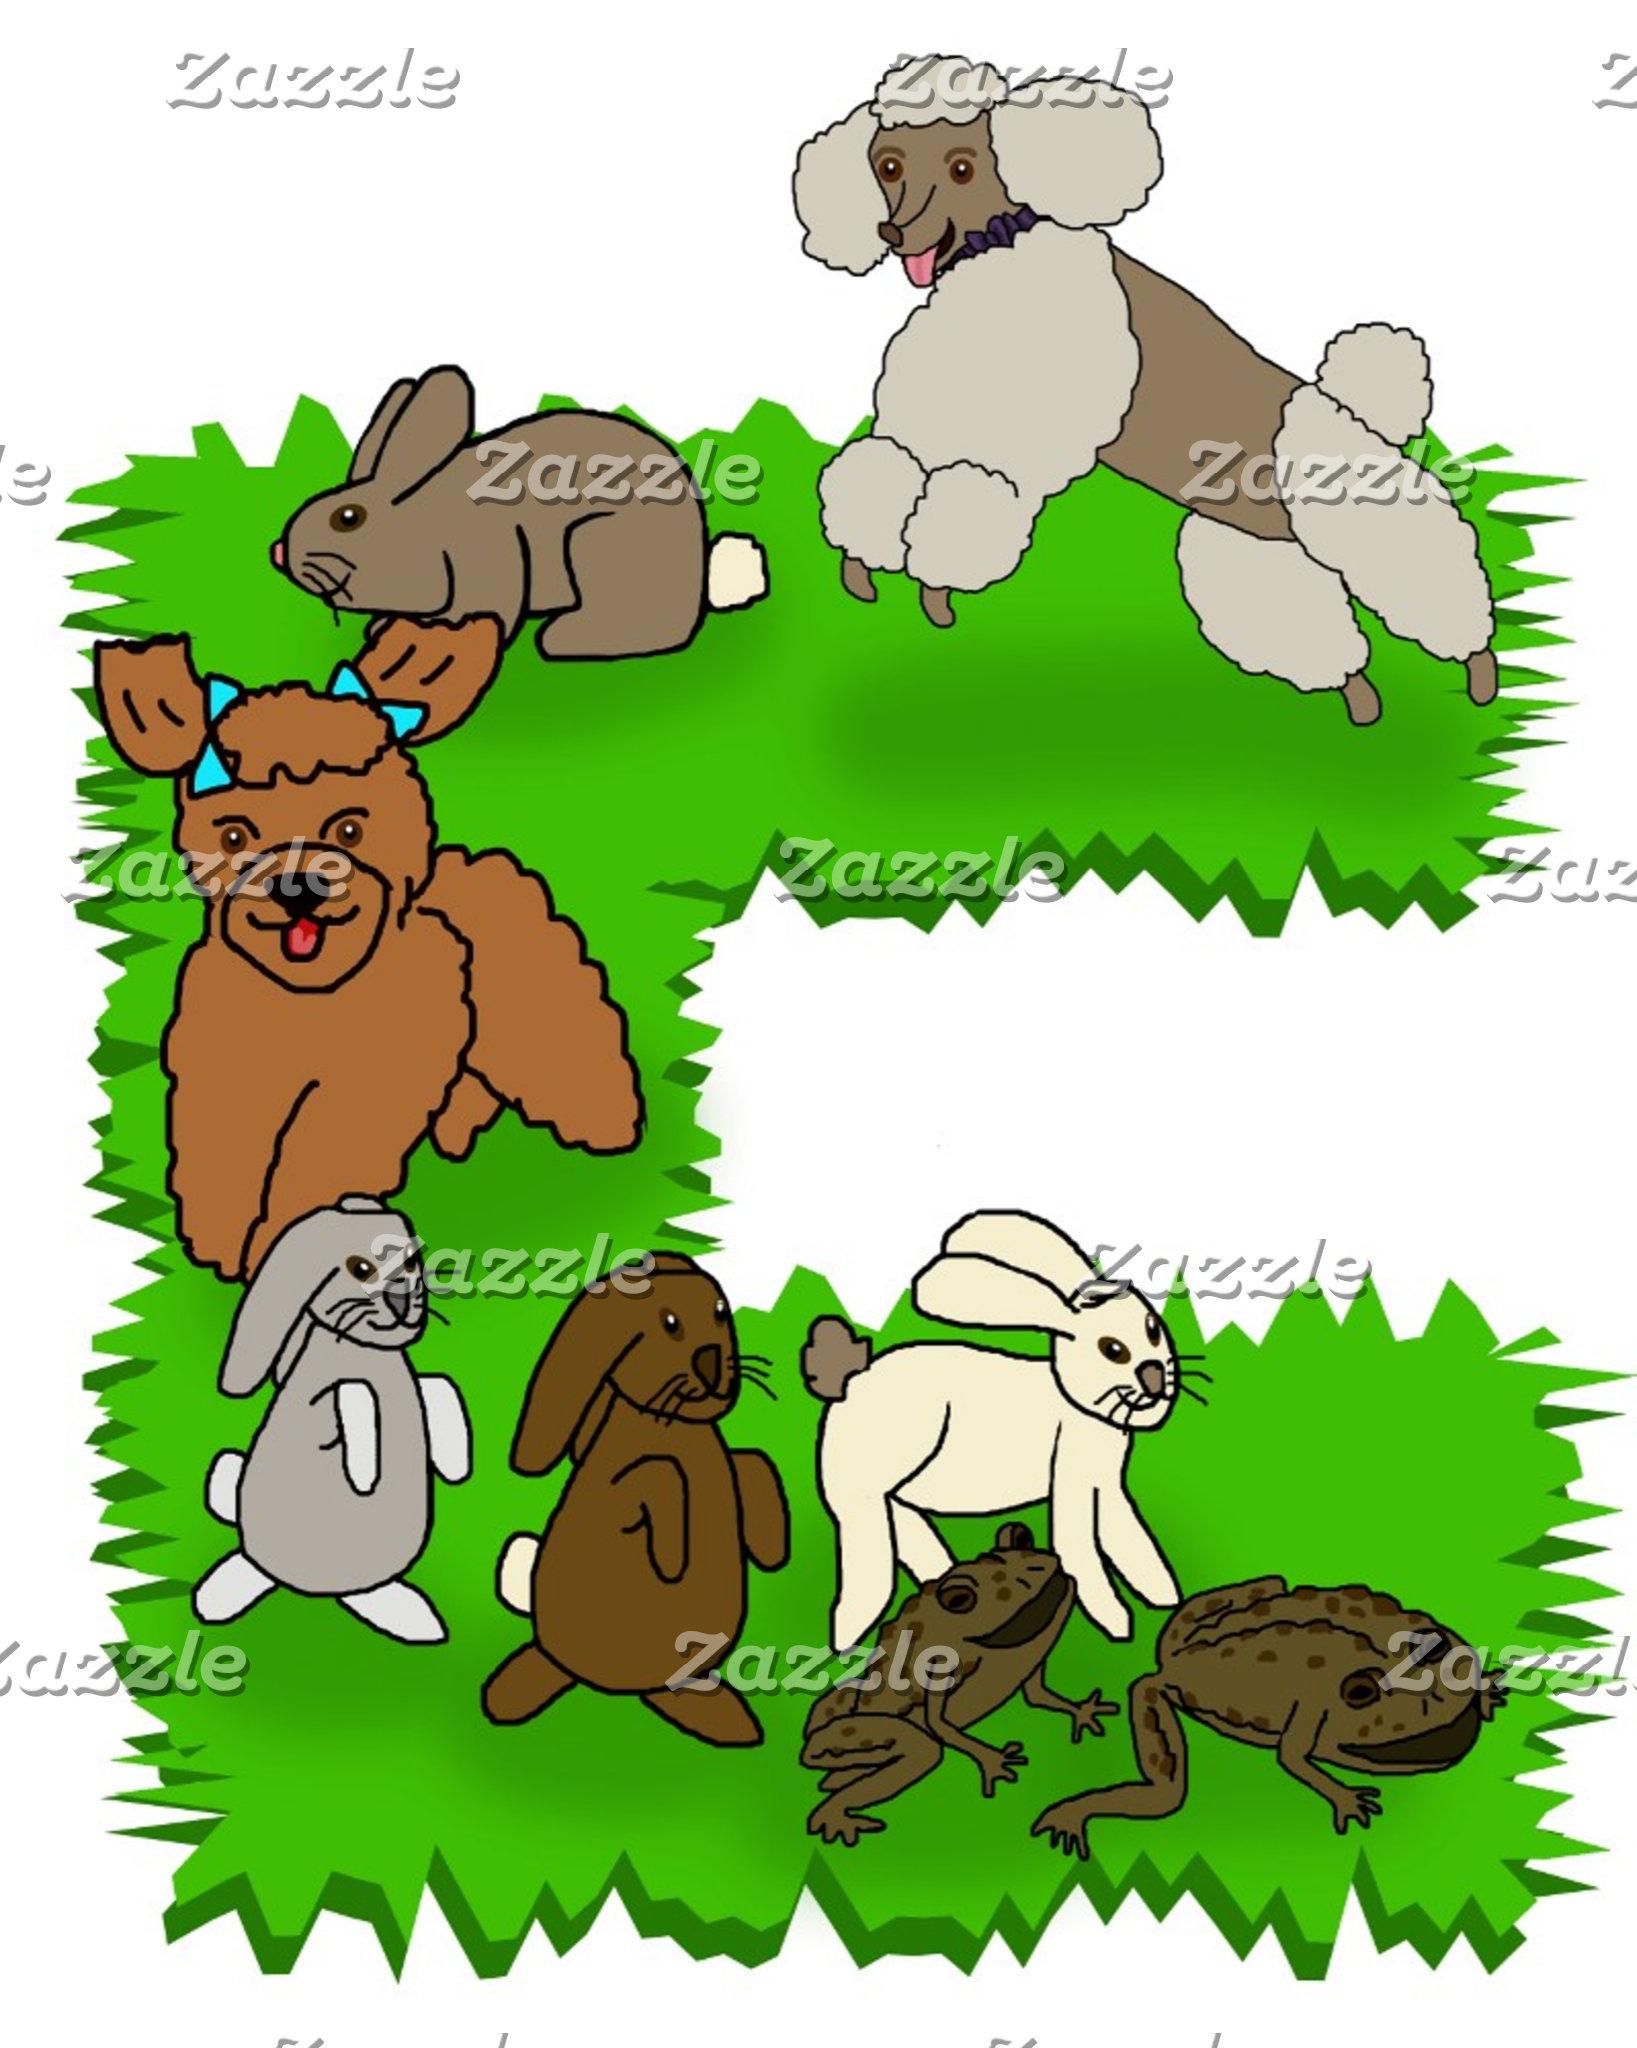 Poodles Bunnies & Toads